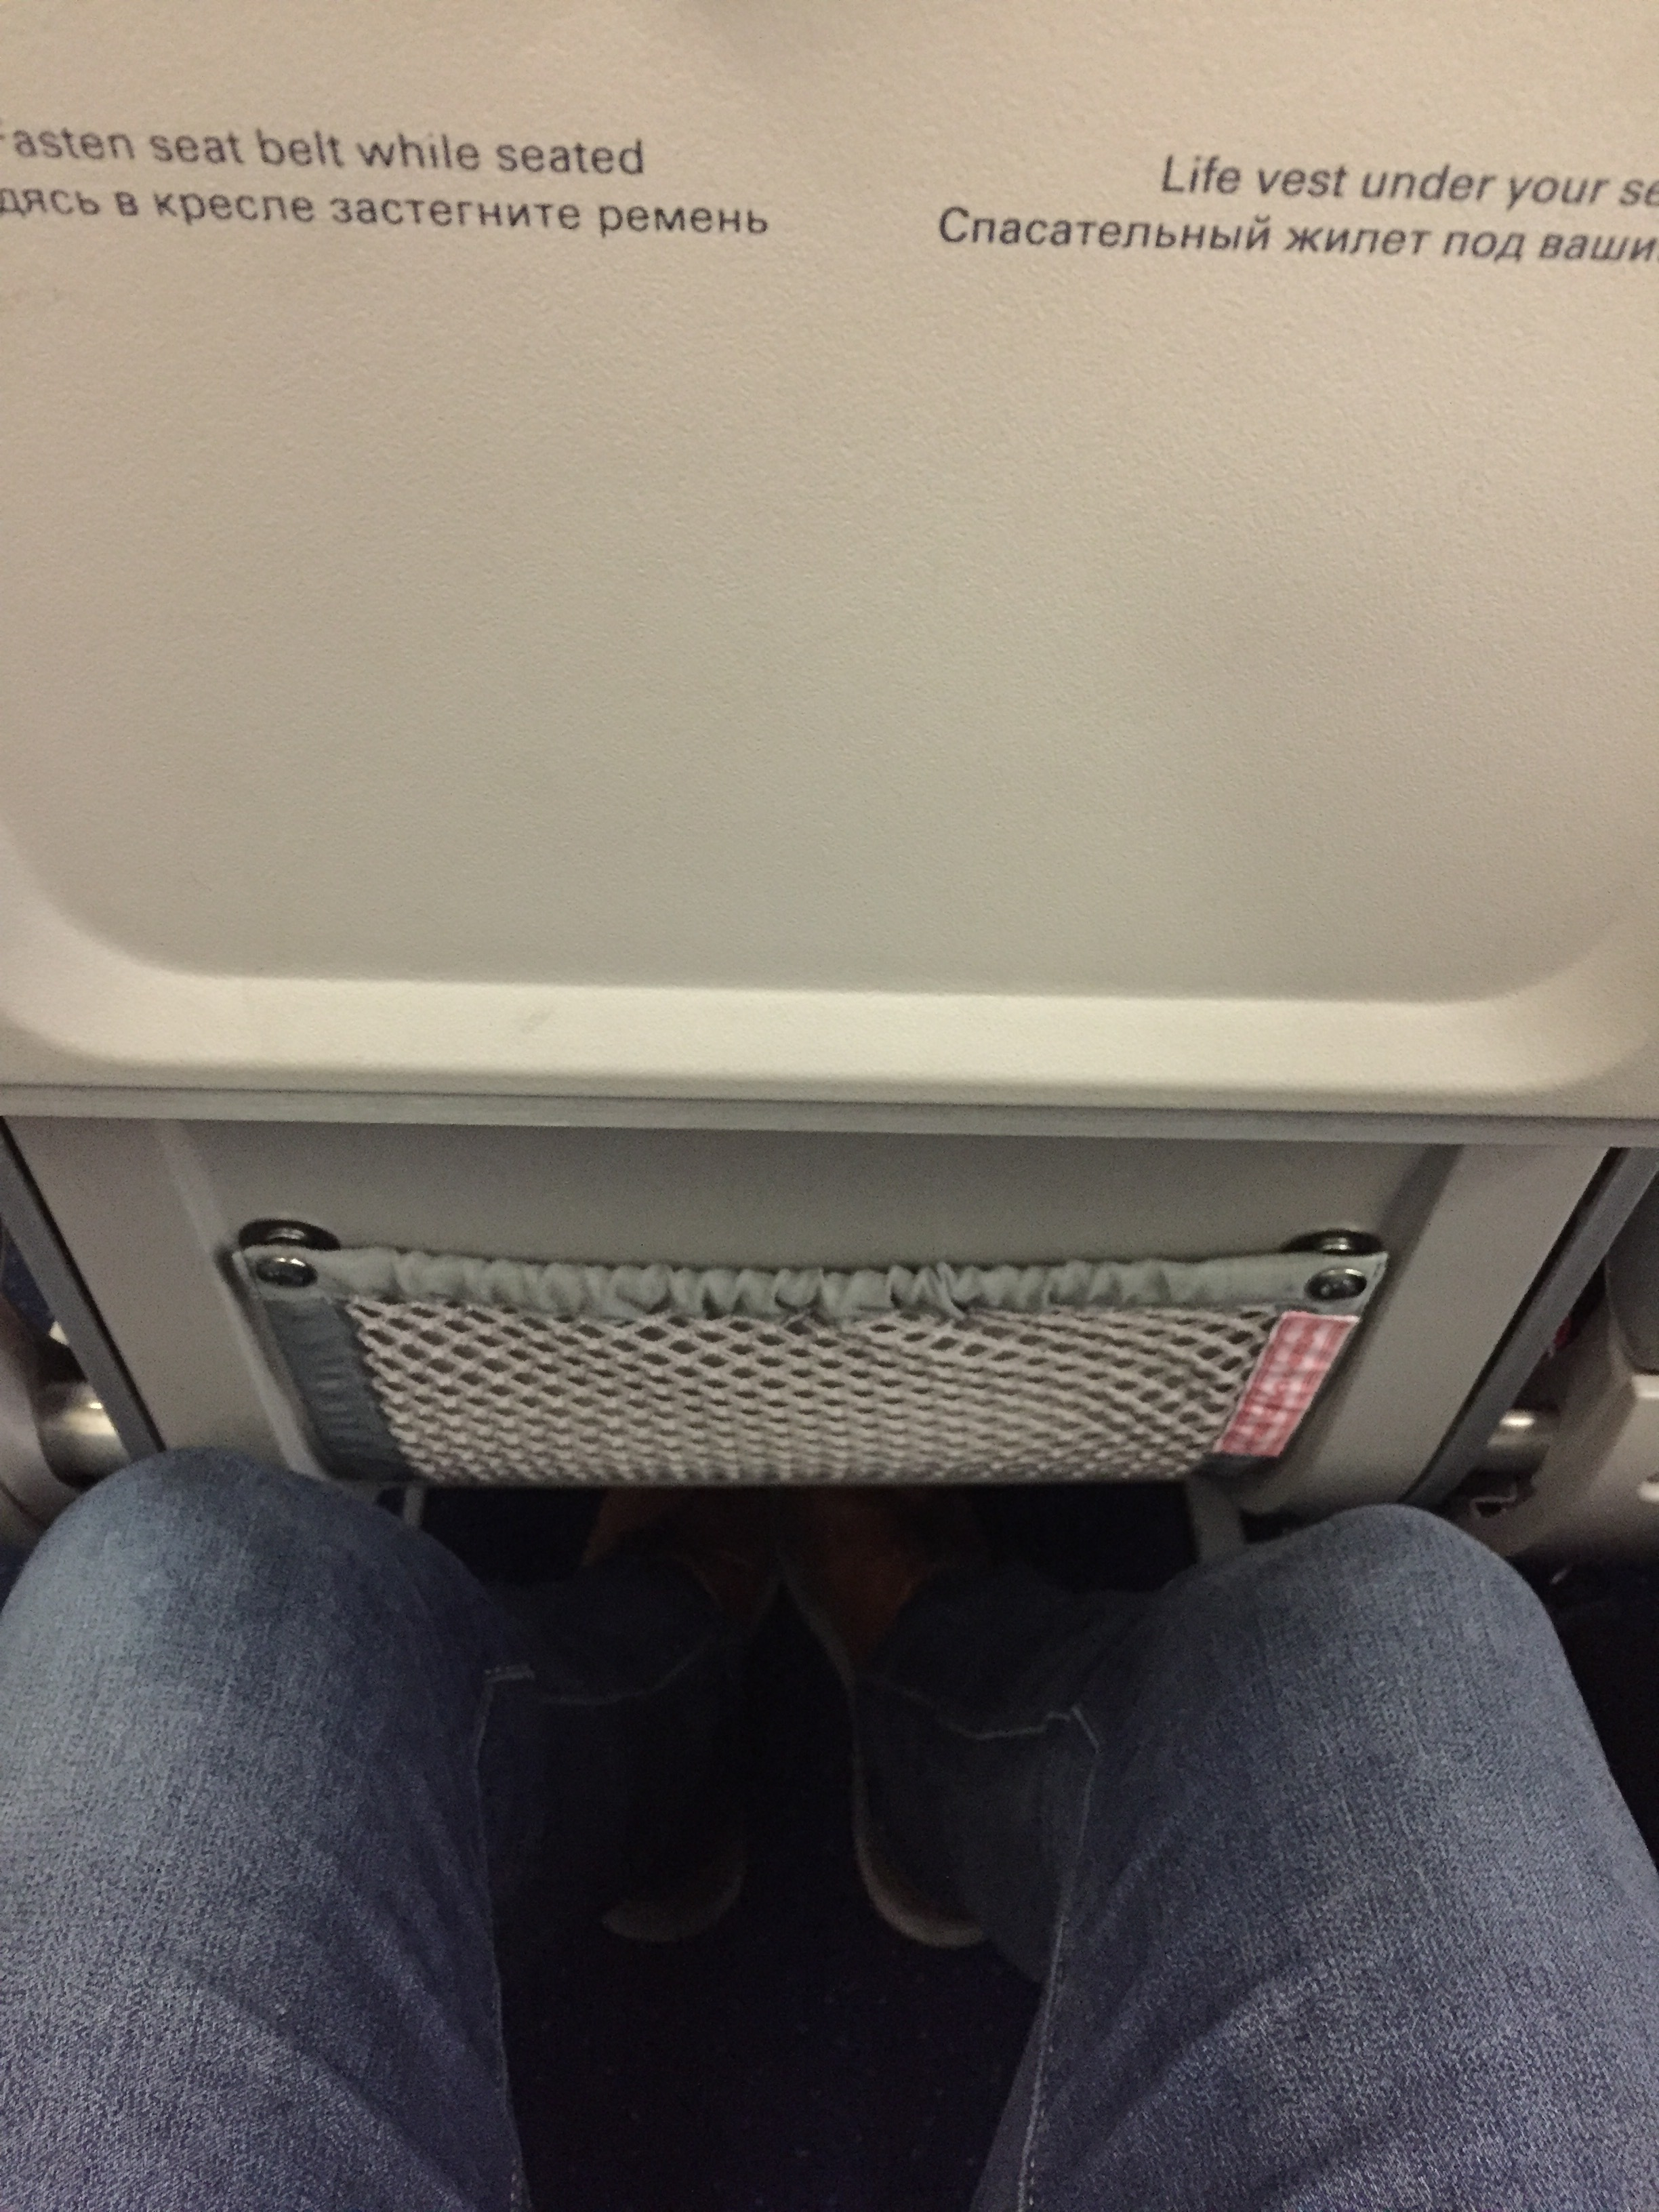 Rossiya airlines seat pitch.JPG